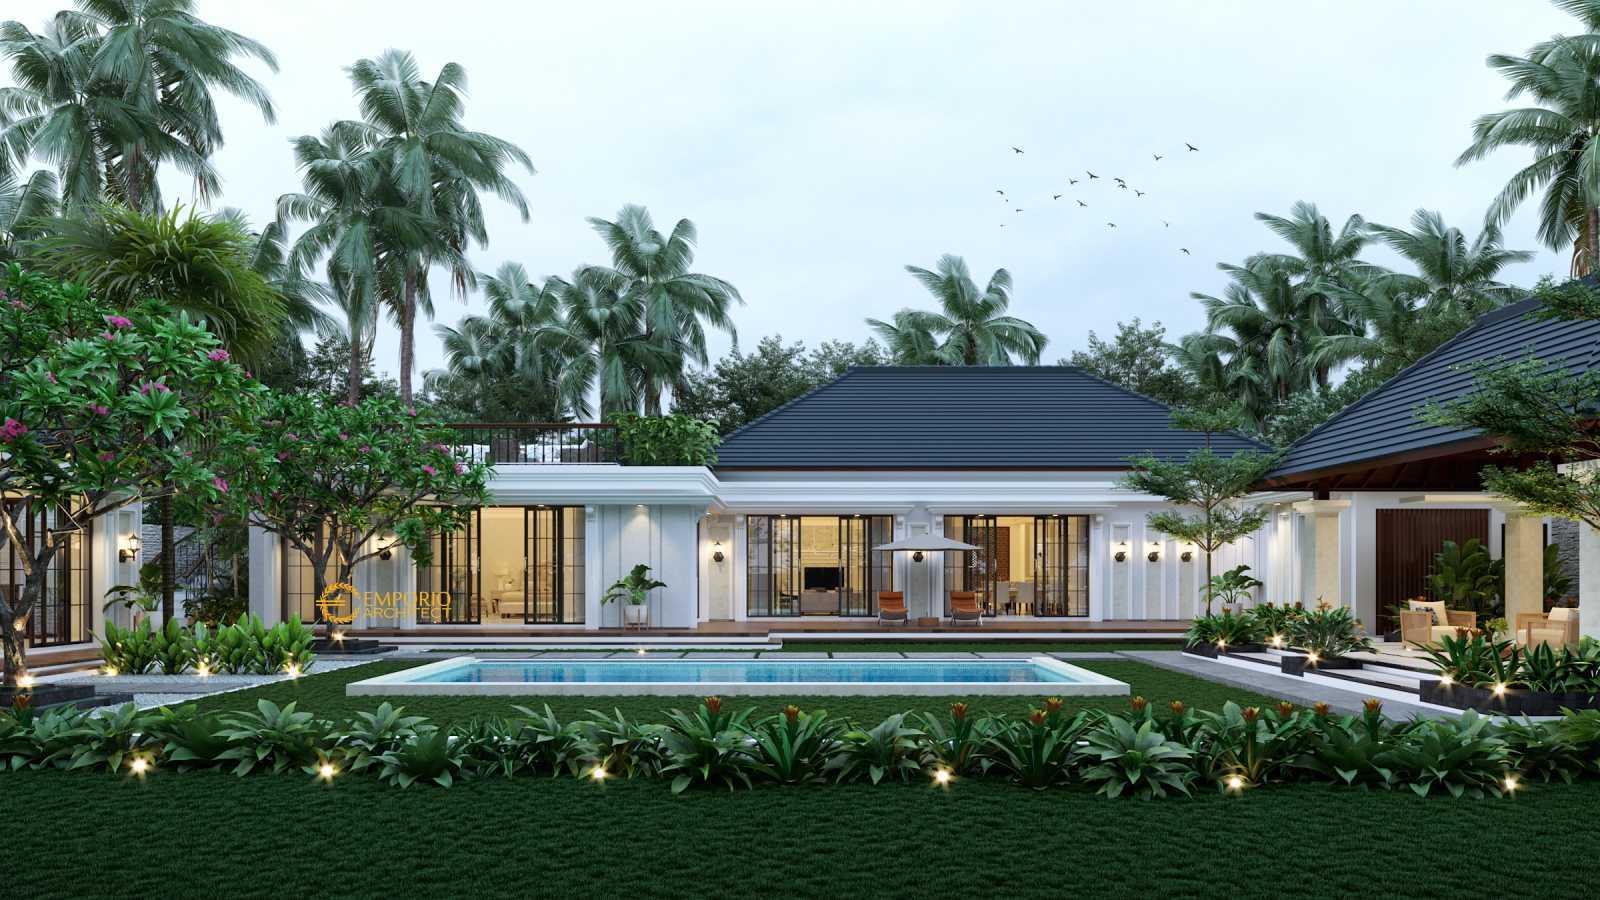 Emporio Architect Desain Rumah Villa Bali Tropis 577 @ Aceh Aceh, Indonesia Aceh, Indonesia Emporio-Architect-Desain-Rumah-Villa-Bali-Tropis-577-Aceh   74489